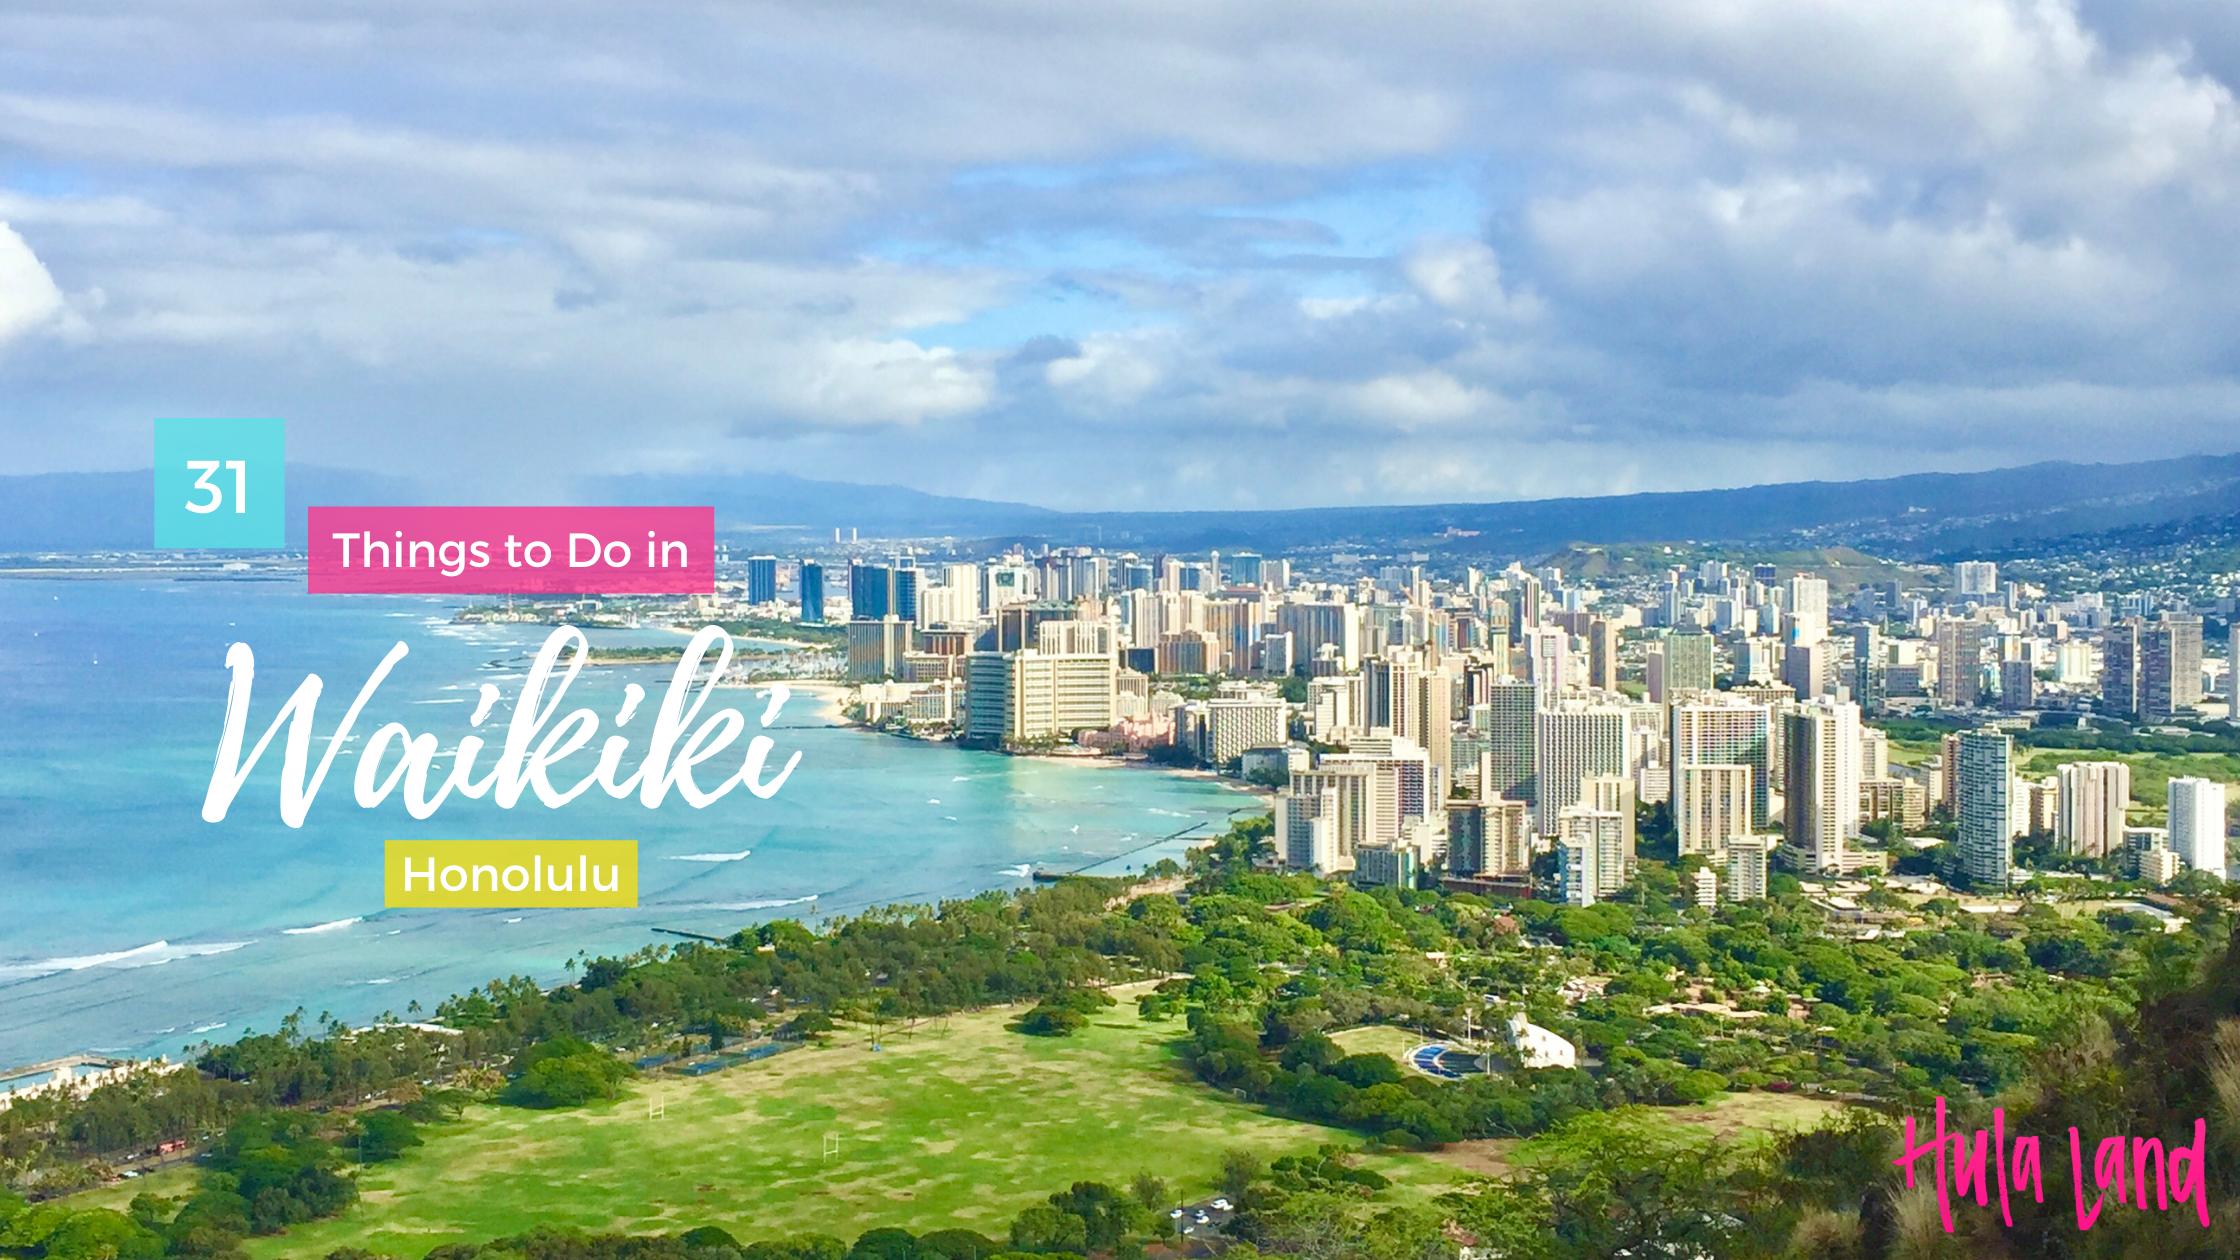 Things to Do in Waikiki and Honolulu